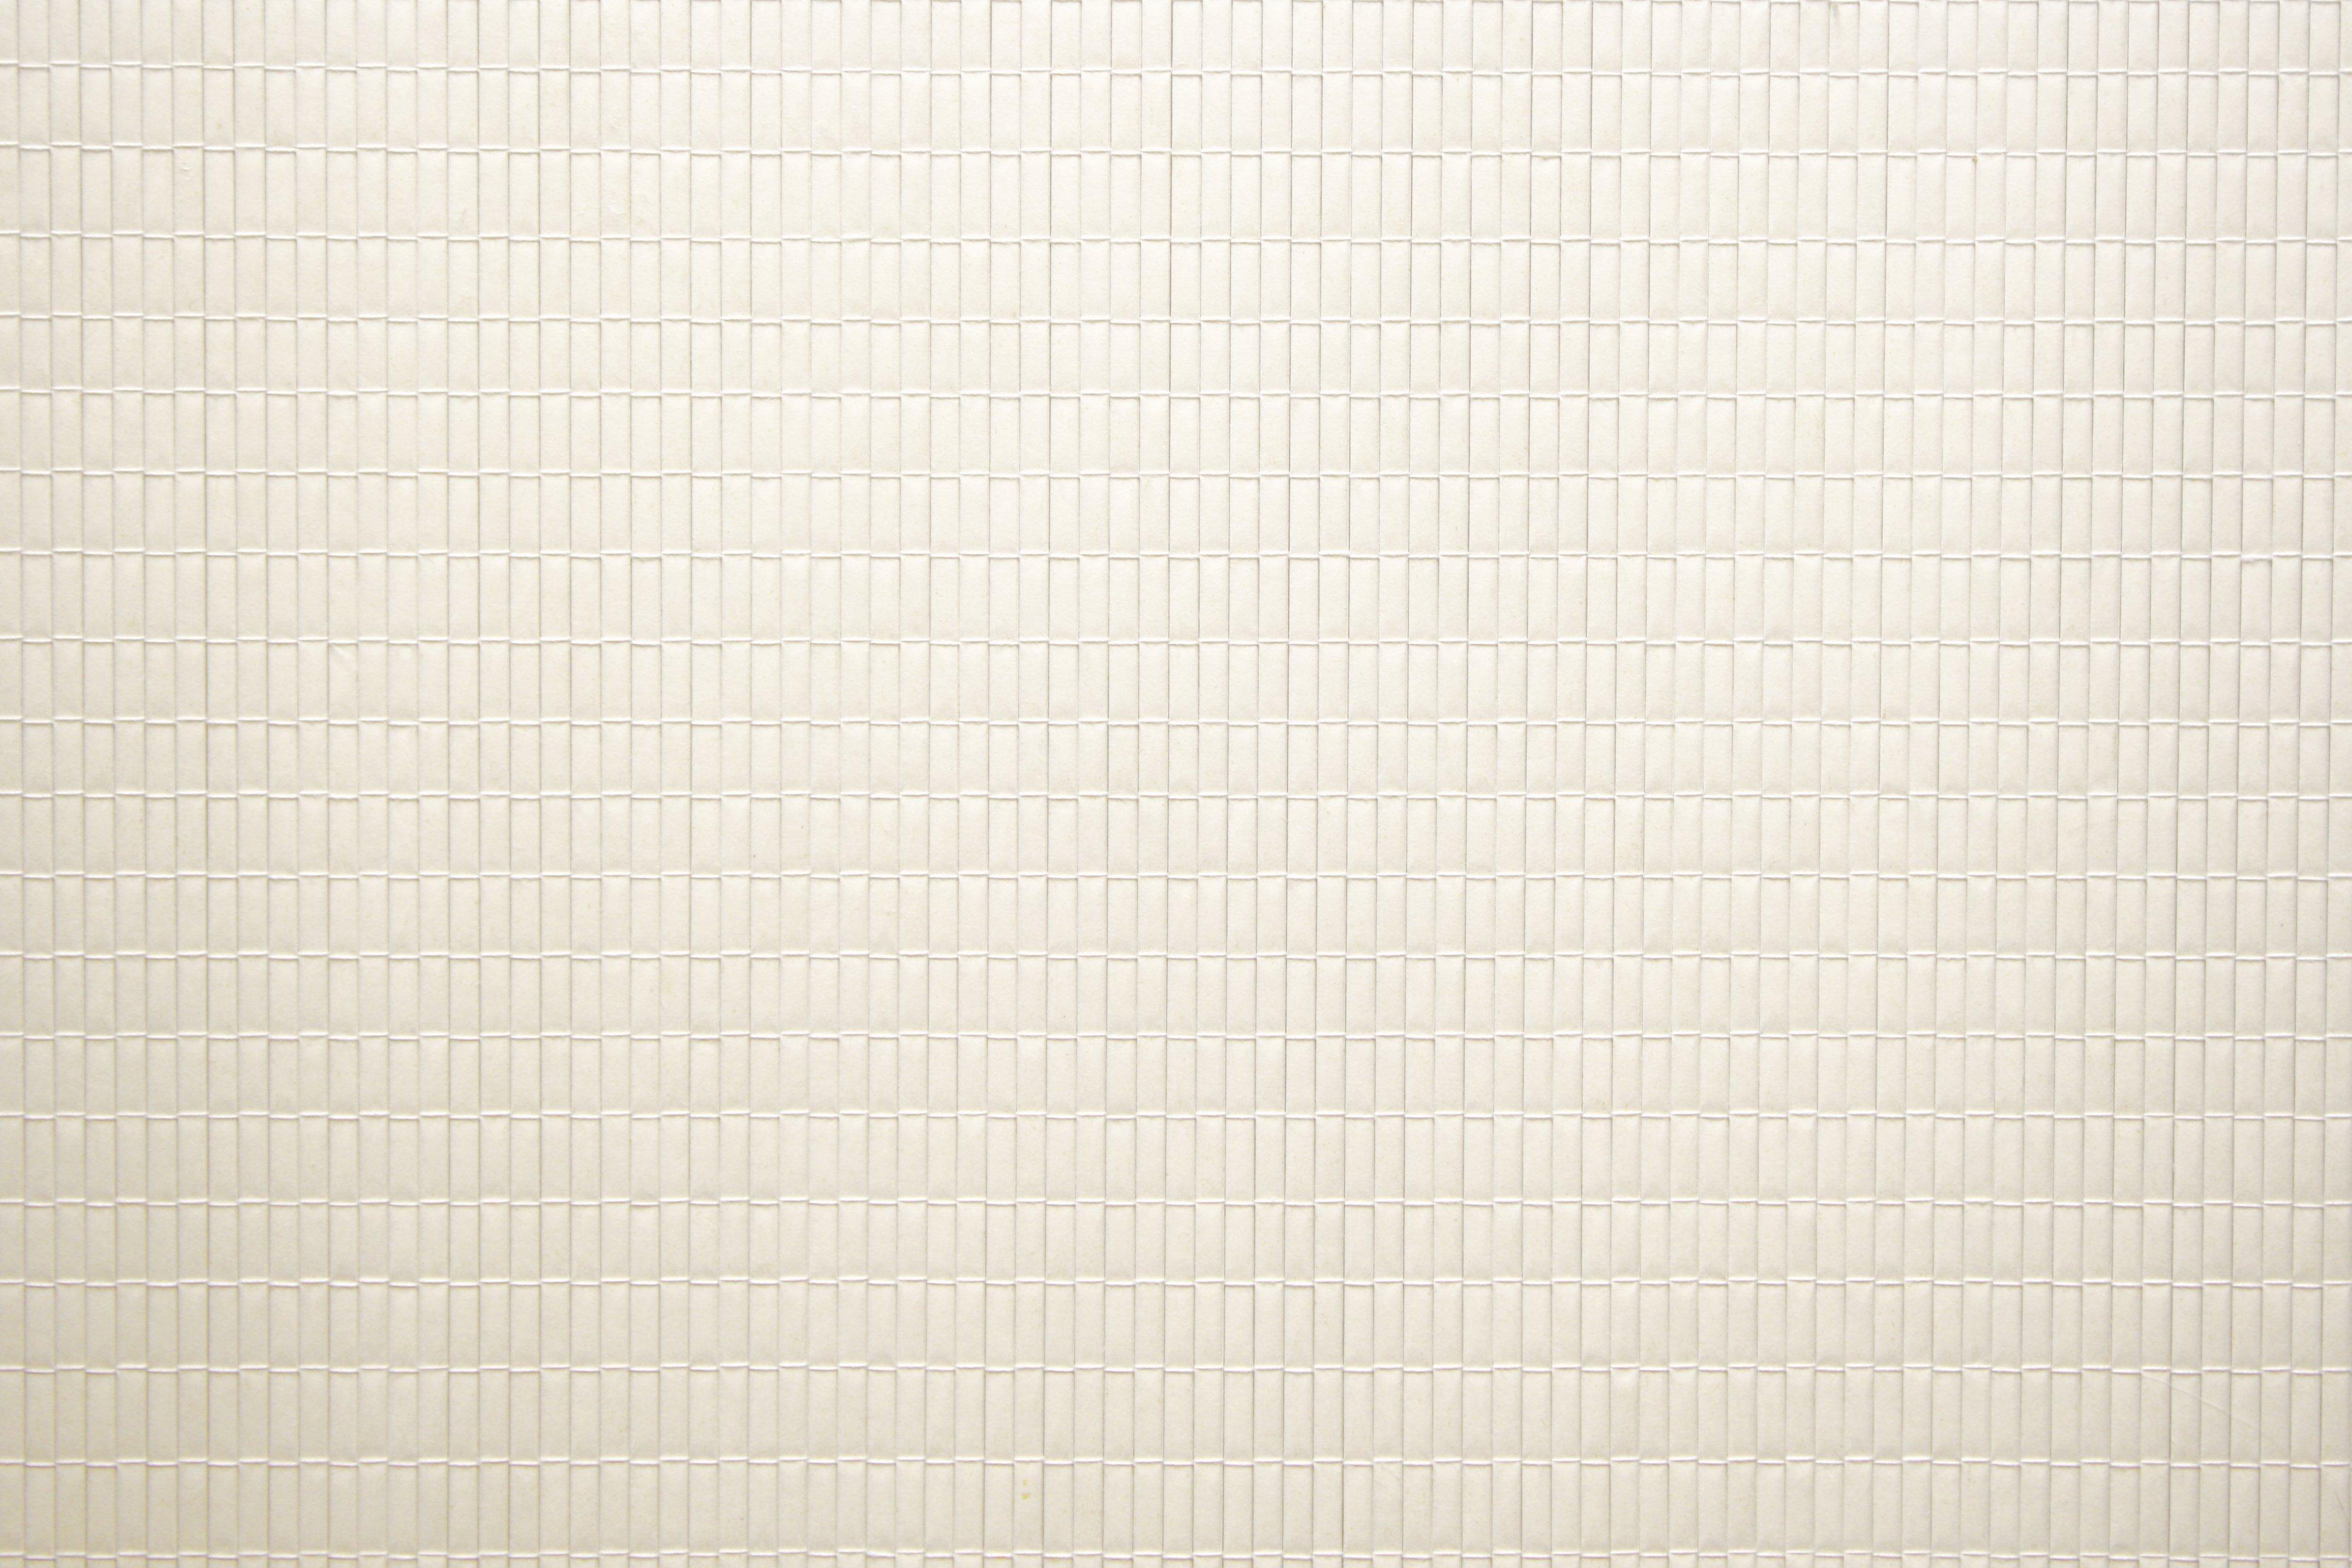 Bamboo Mat Texture Picture | Free Photograph | Photos Public Domain